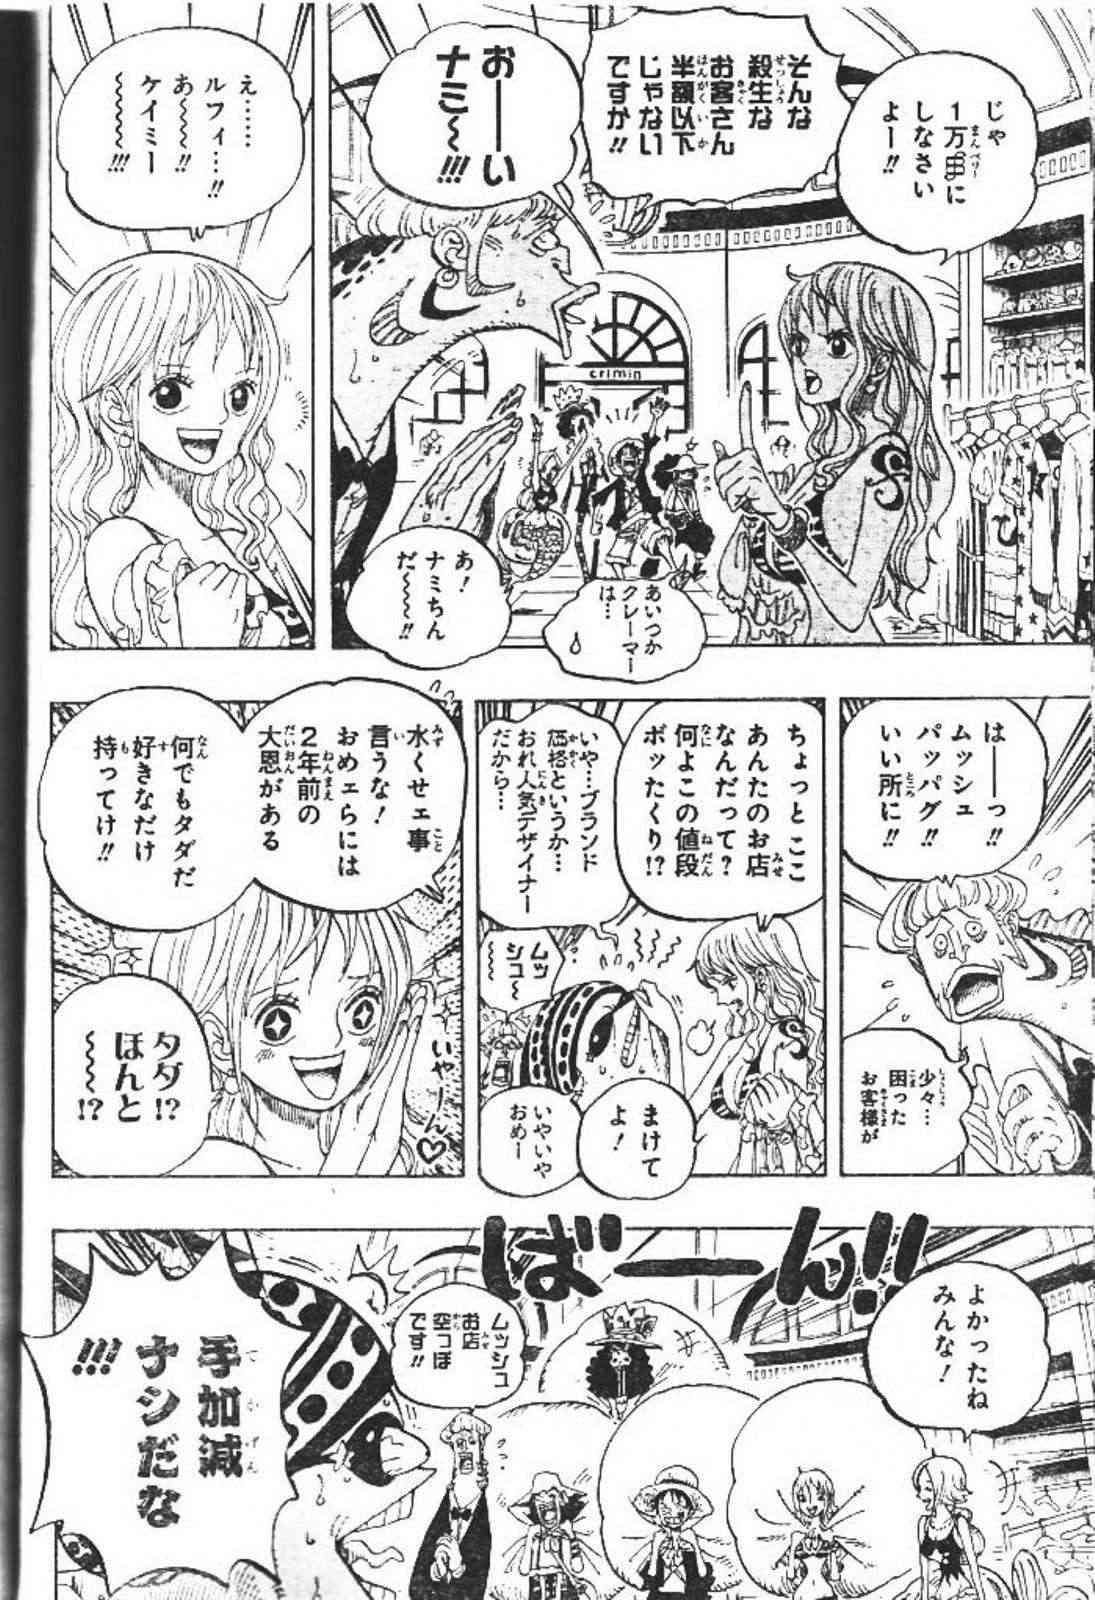 One Piece Manga 611 Spoiler Pics 08_raw10